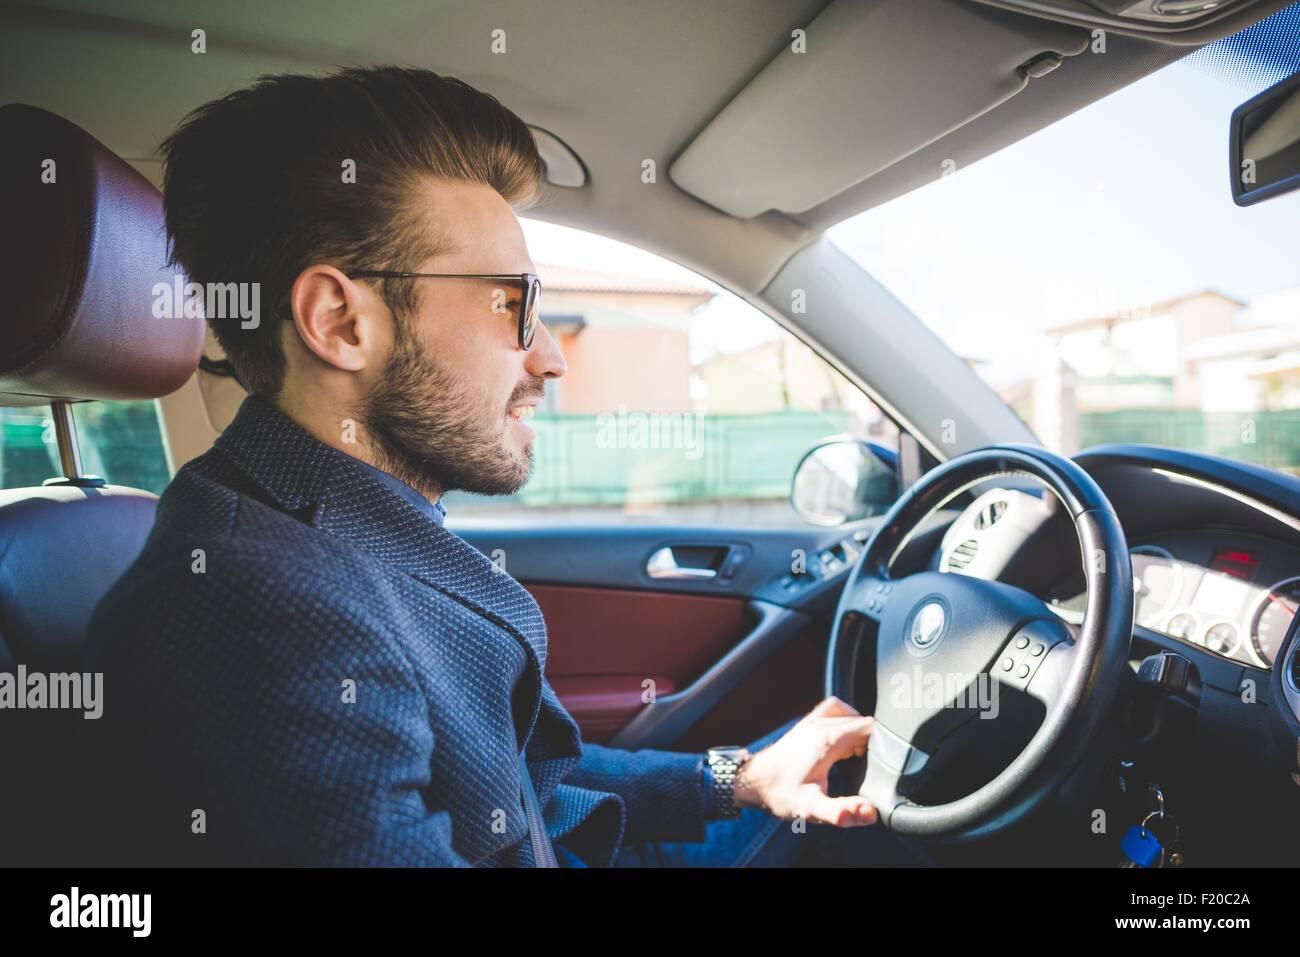 Stylish Young Man Driving Car